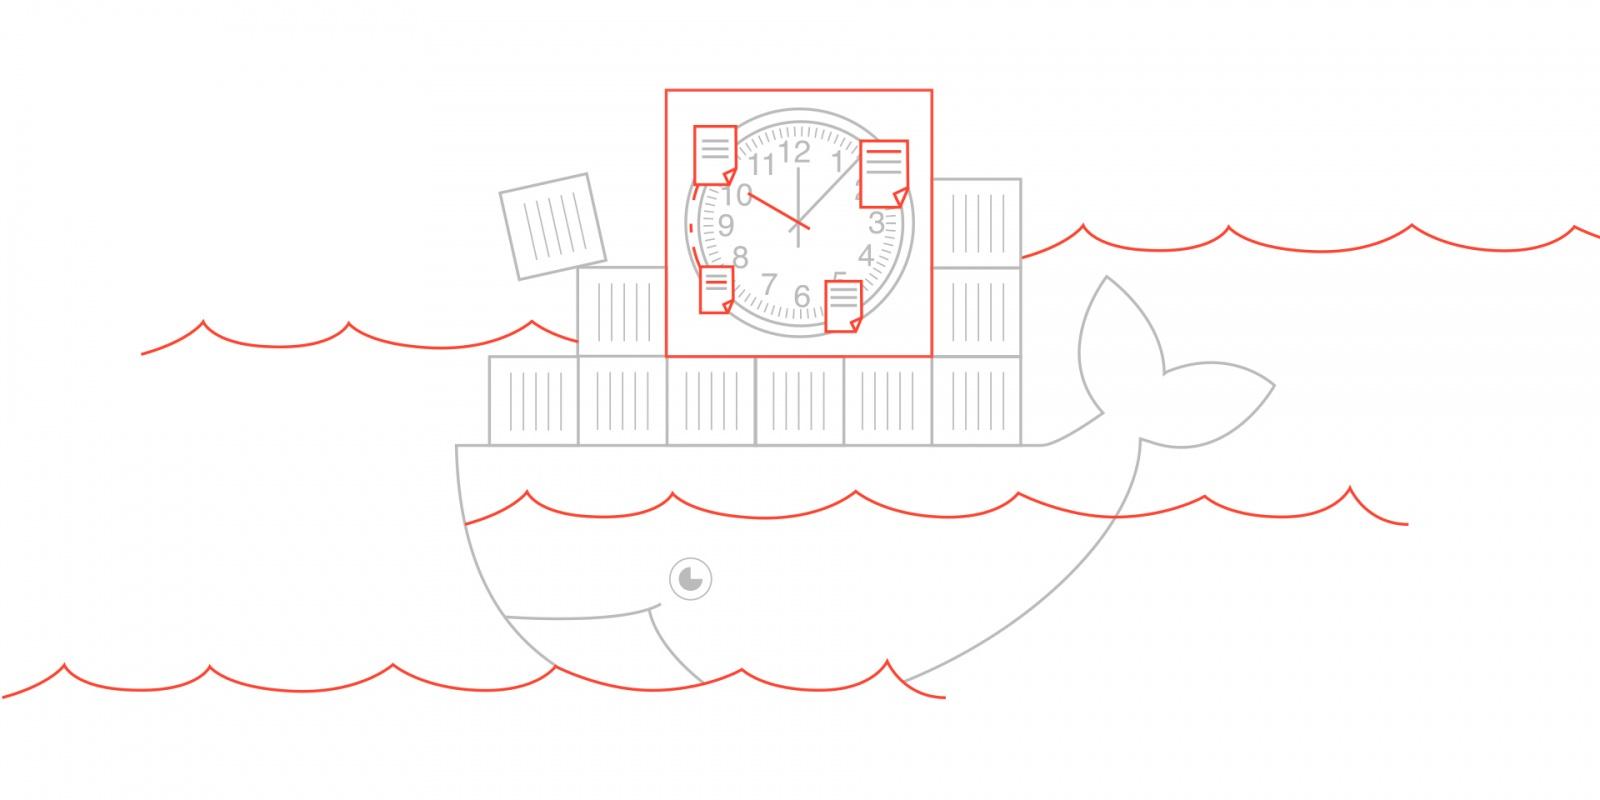 Запуск cron внутри Docker-контейнера - 1